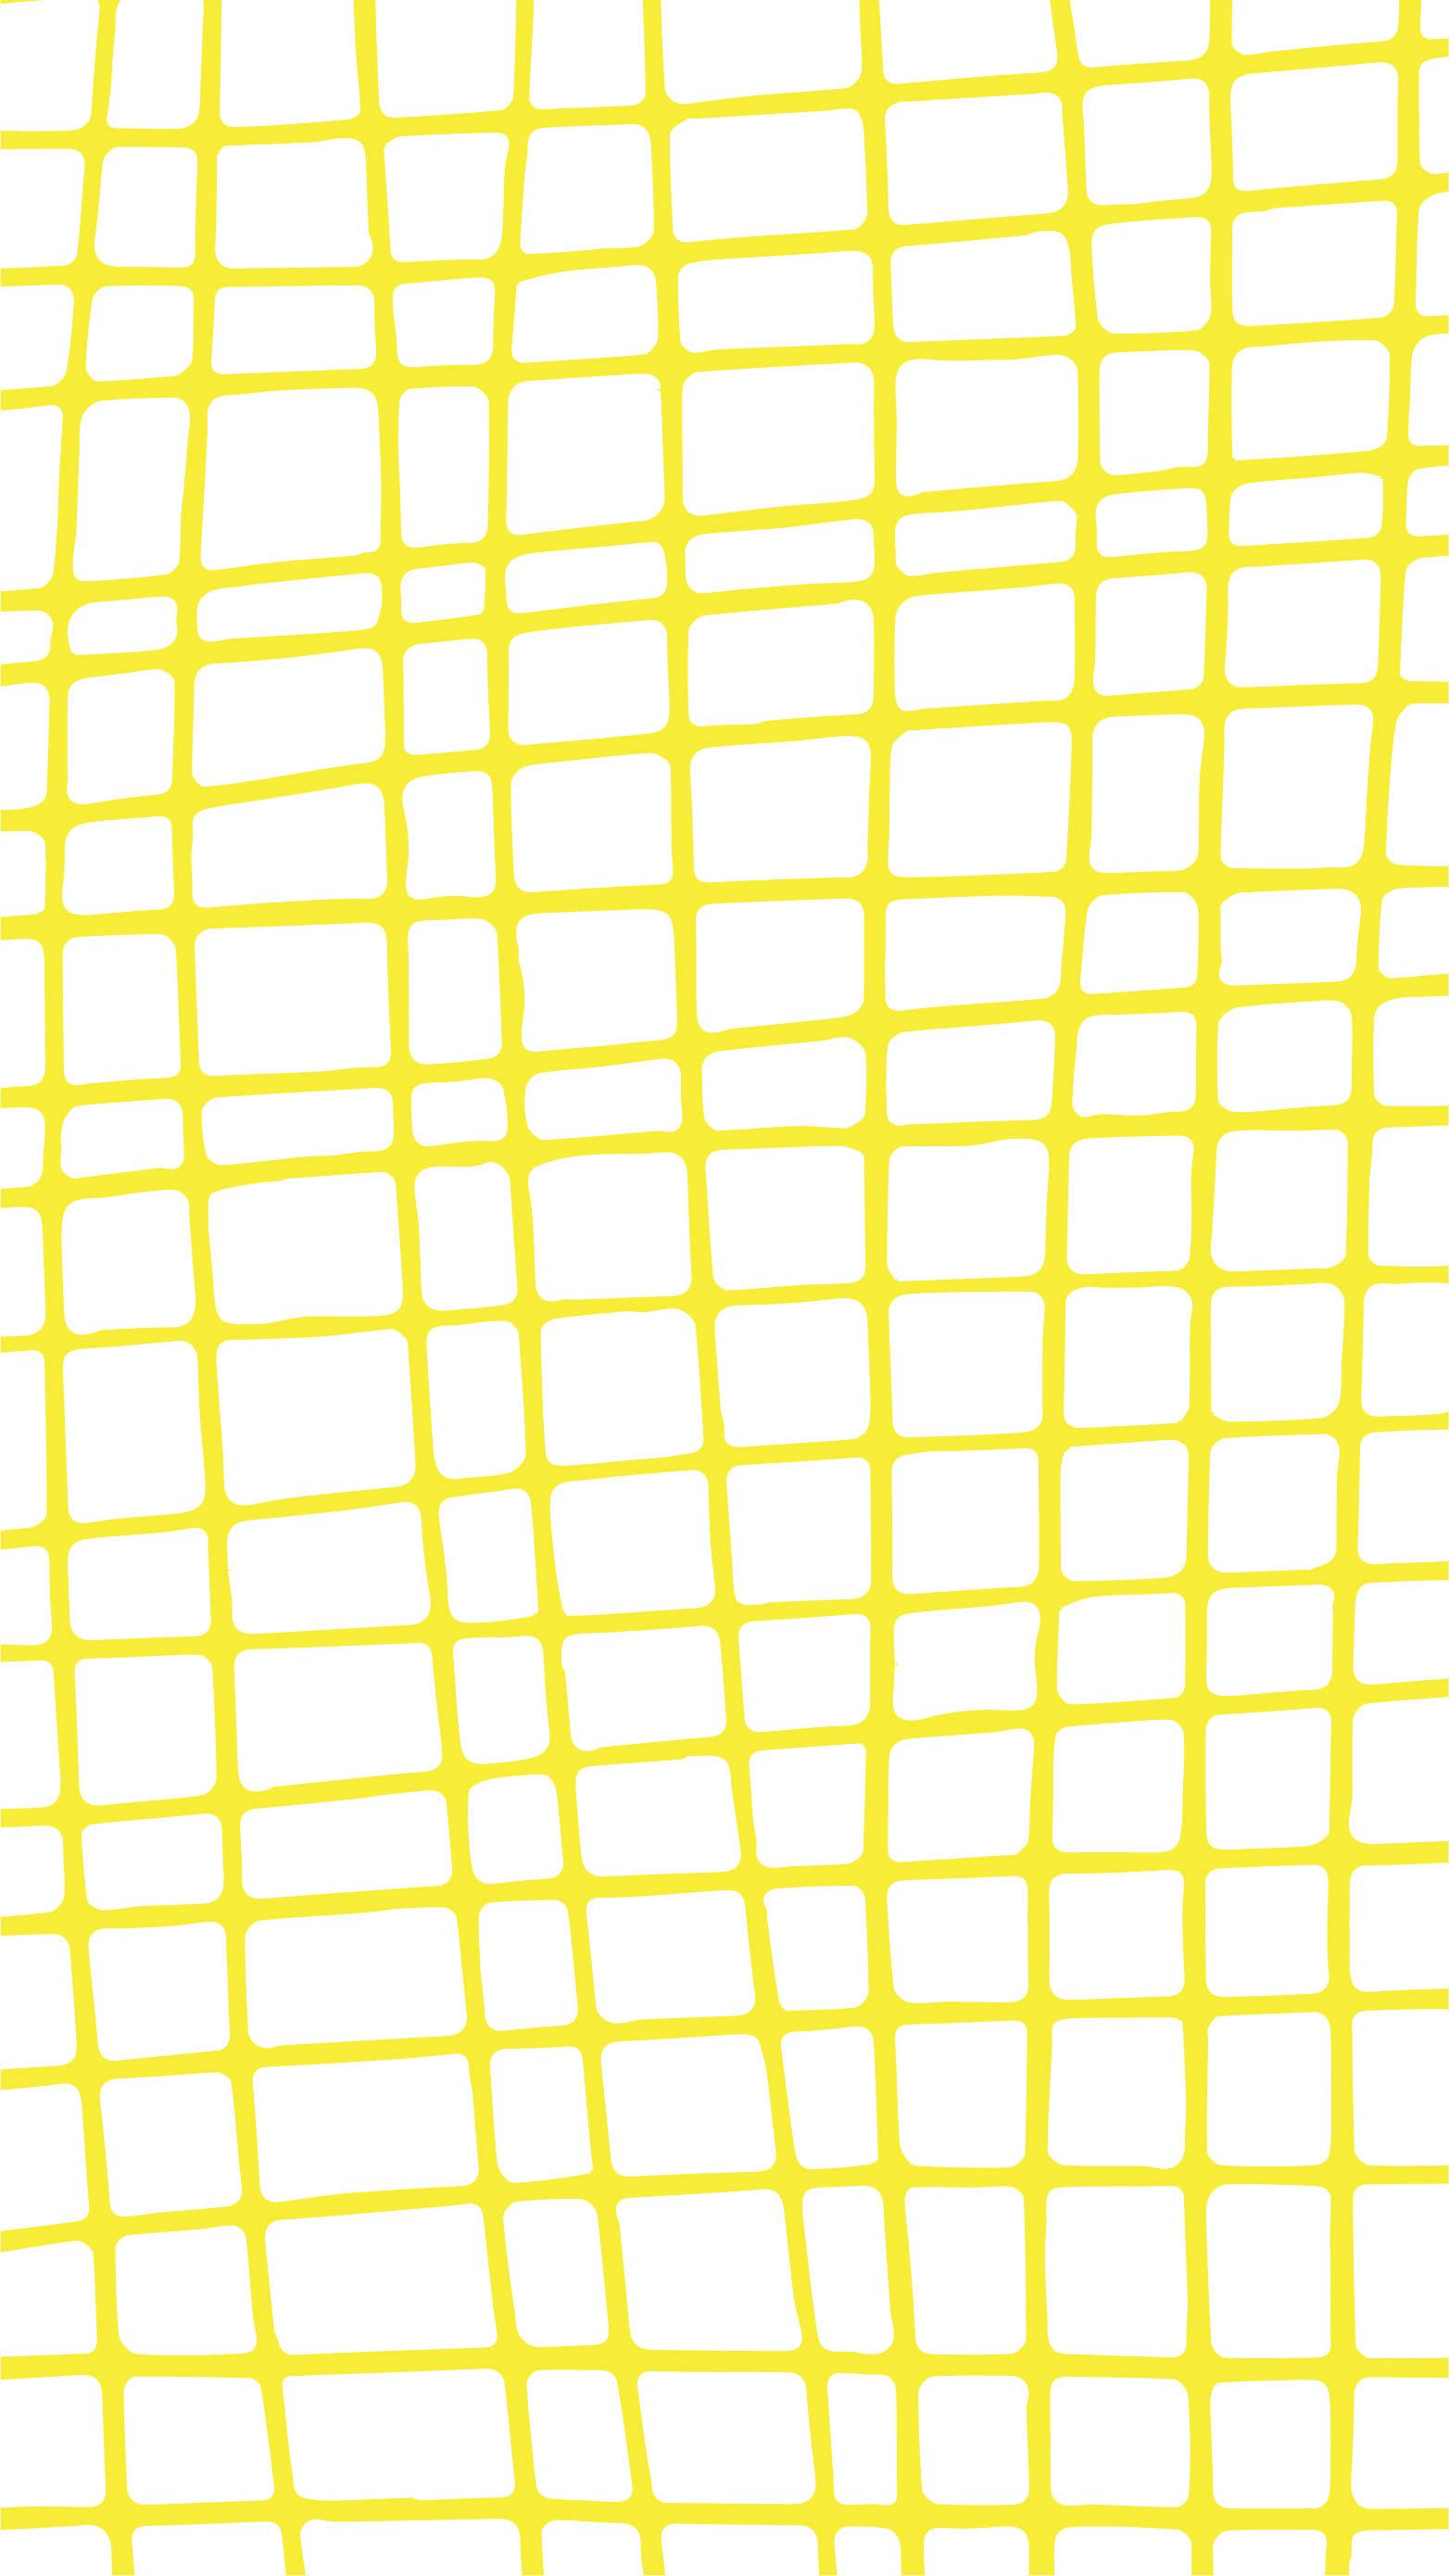 wallpaper-04.jpg